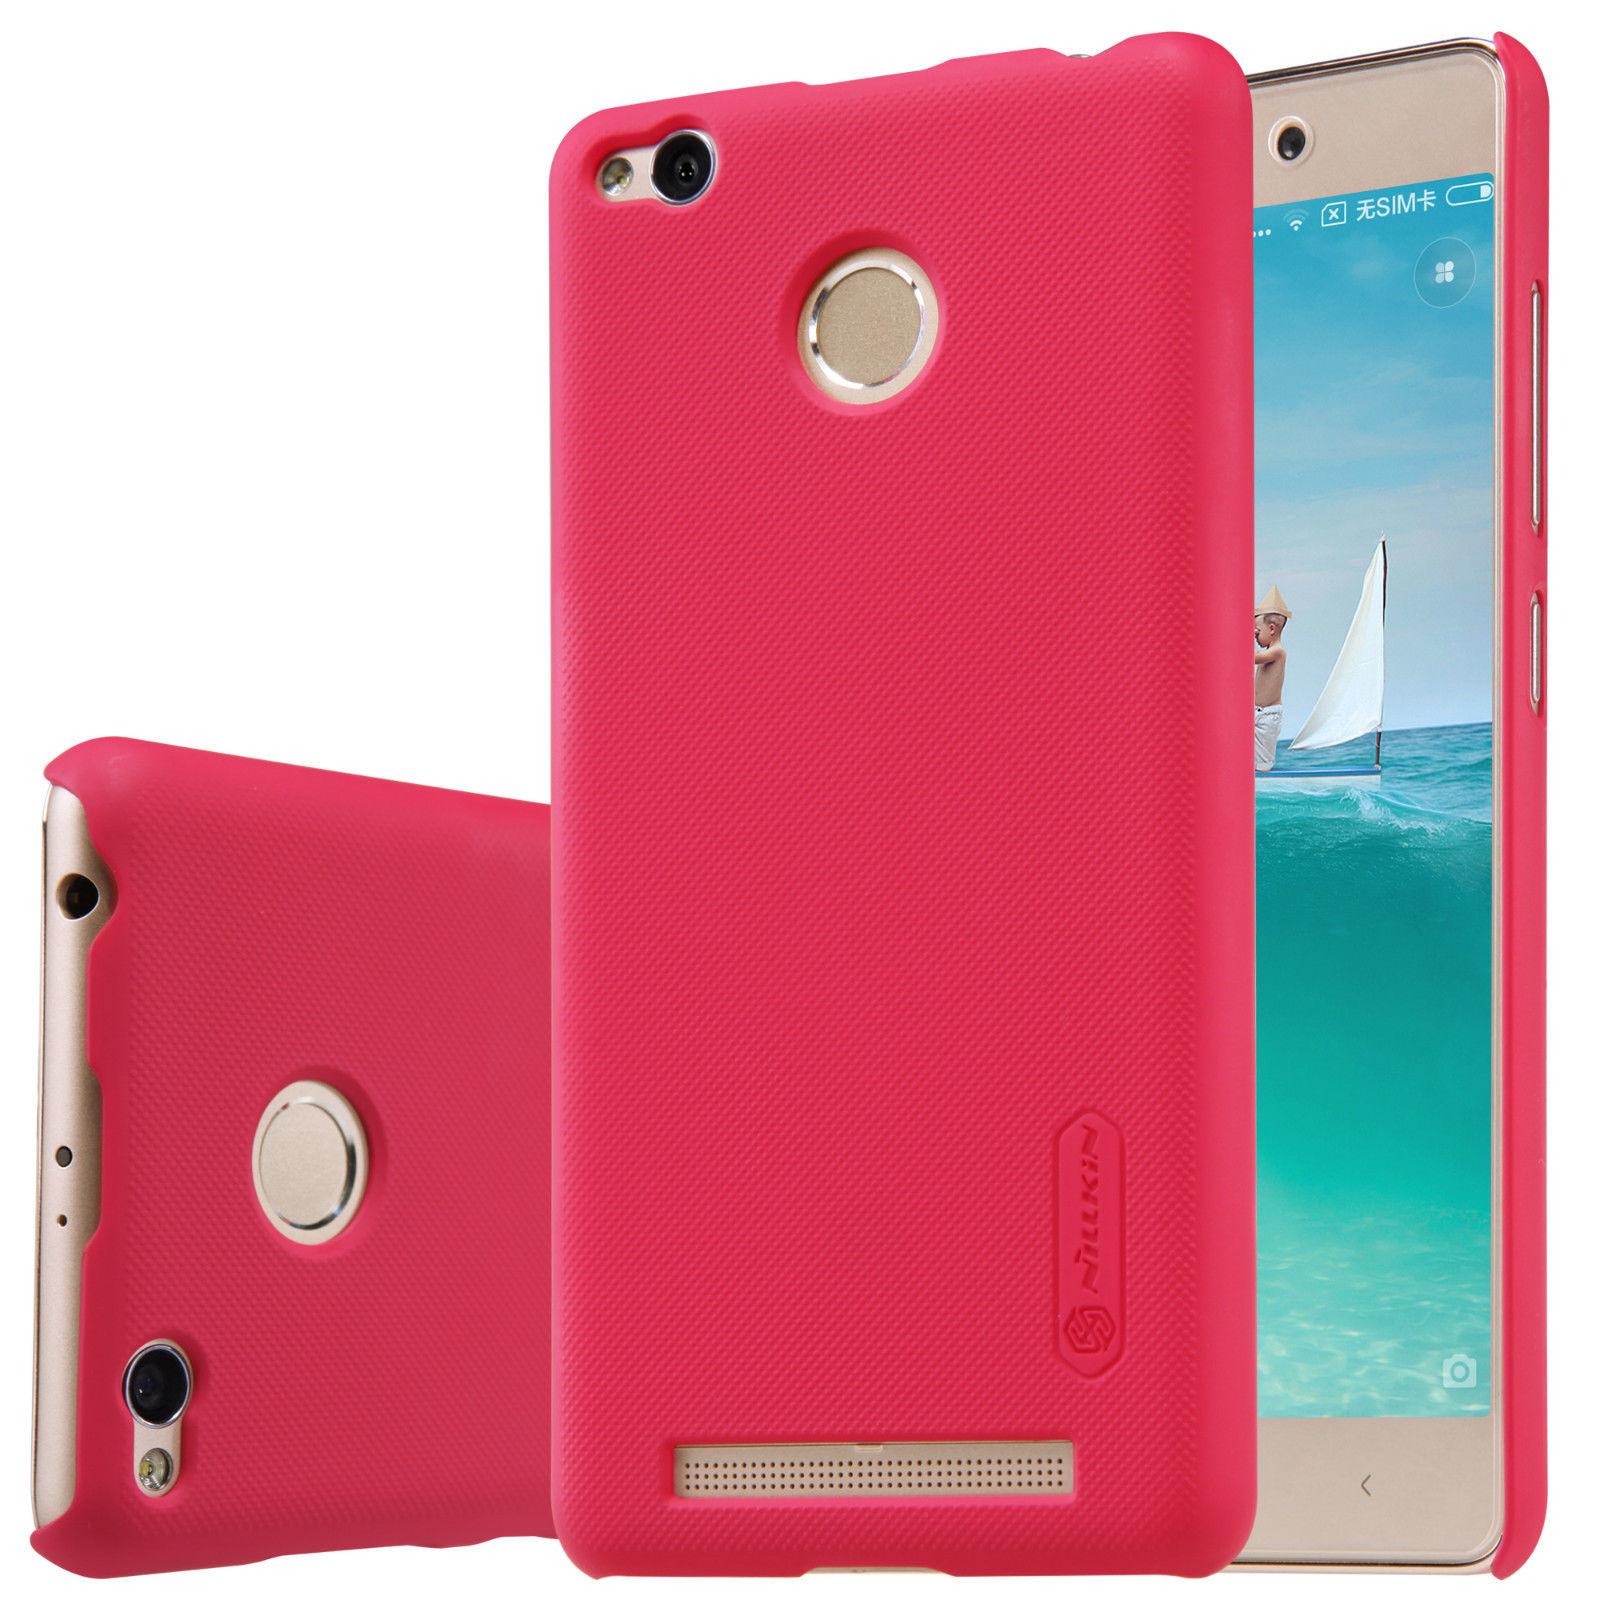 Купить Чехол Nillkin Matte для Xiaomi Redmi 3 Pro / Redmi 3s (+ пленка) Красный